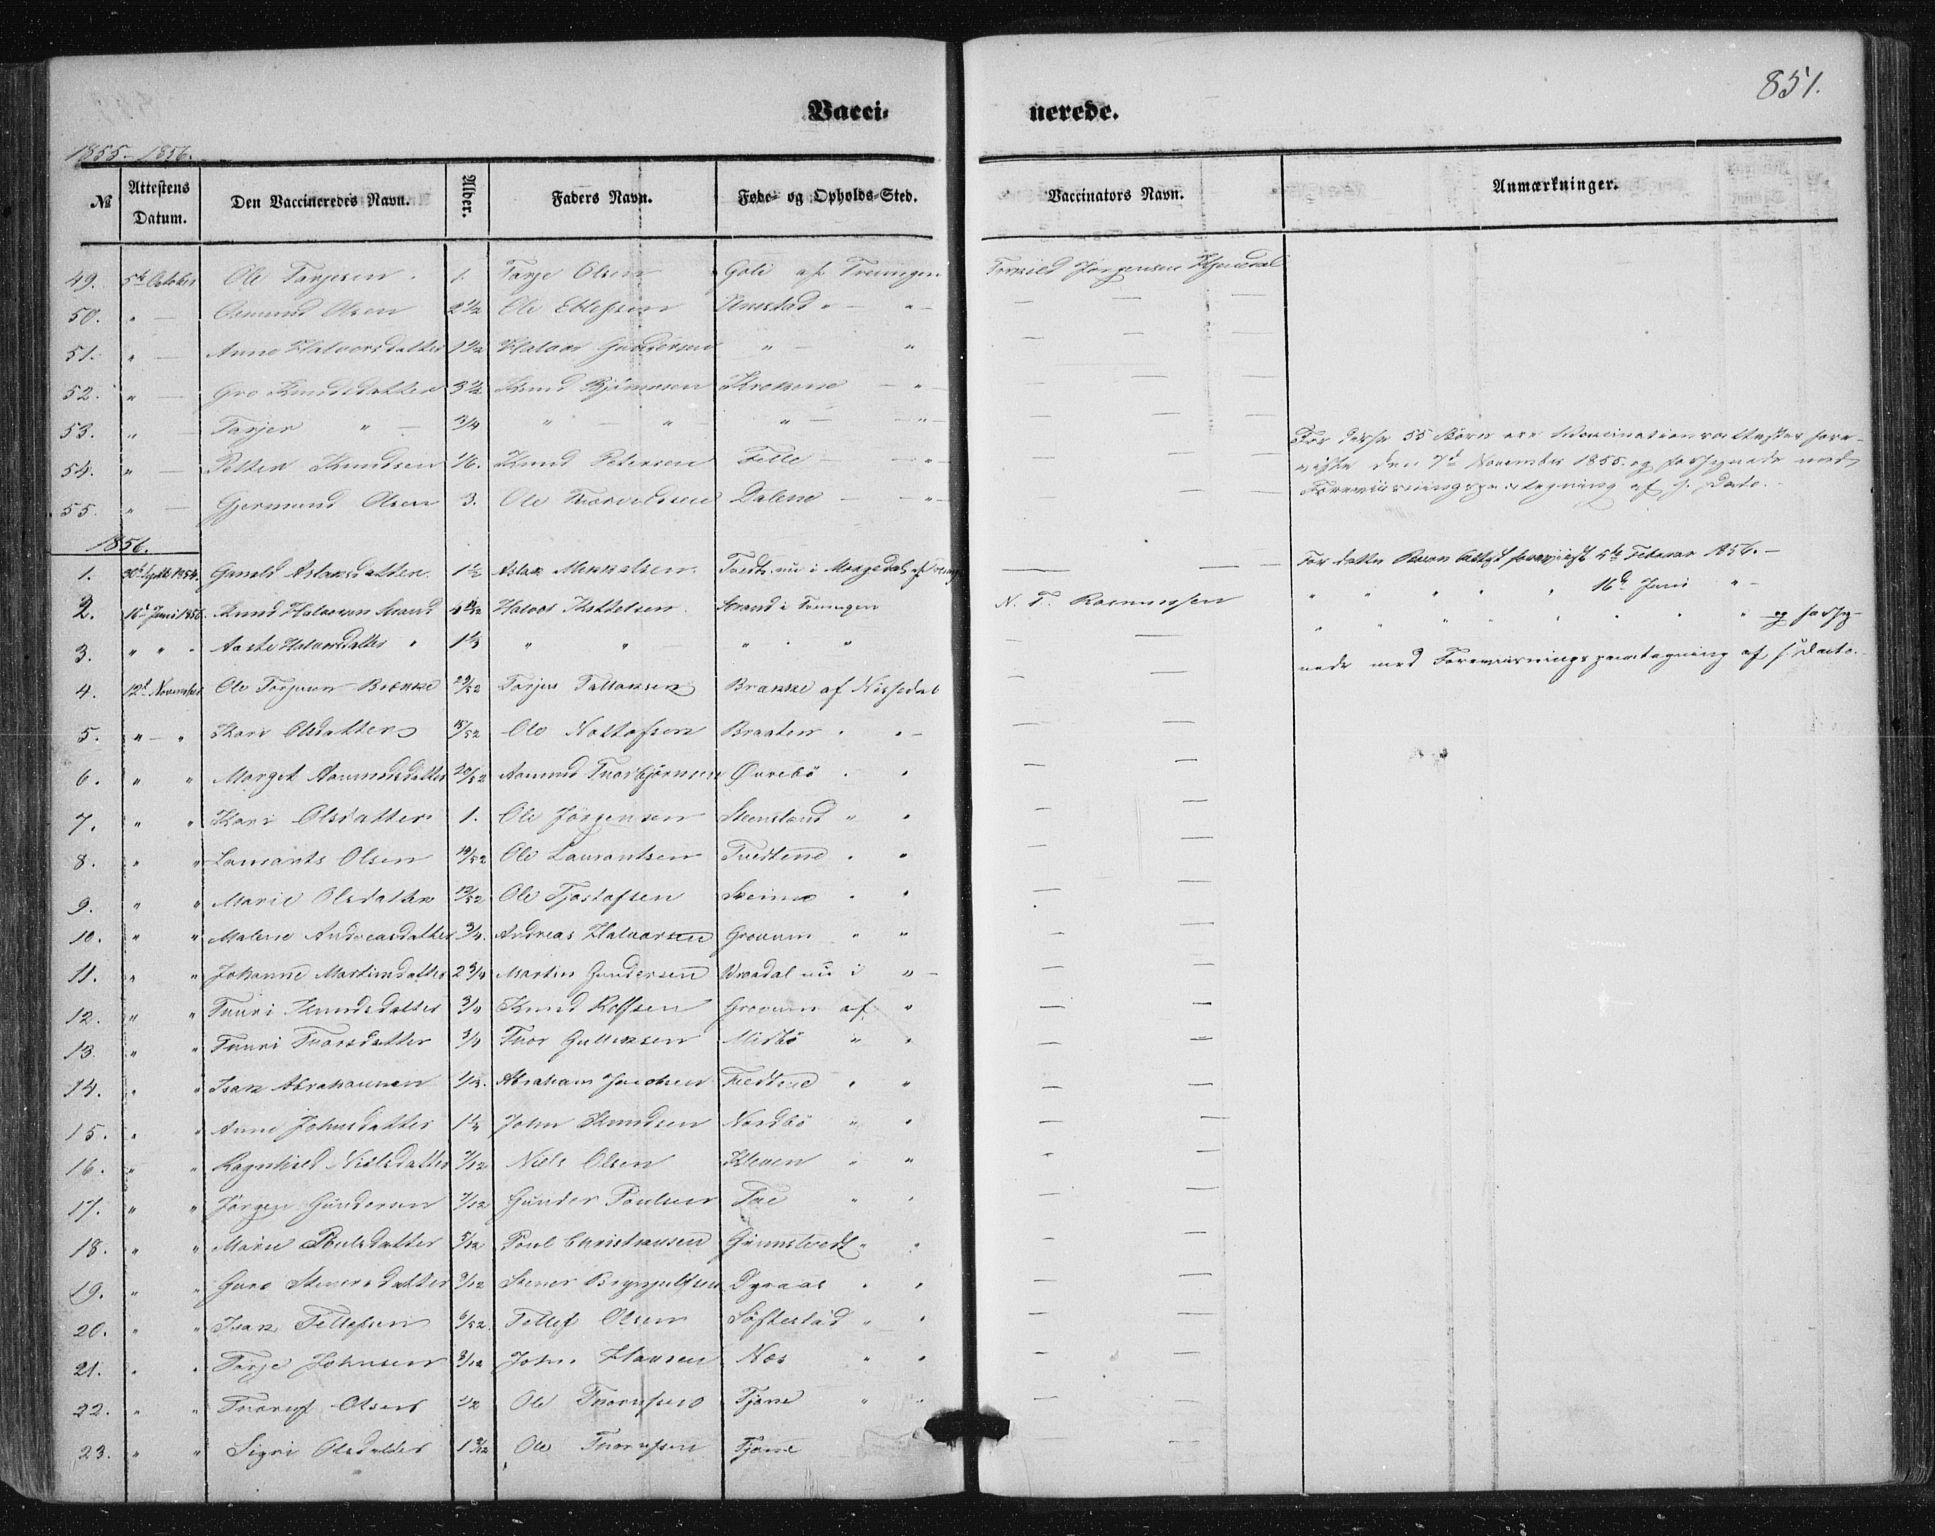 SAKO, Nissedal kirkebøker, F/Fa/L0003: Ministerialbok nr. I 3, 1846-1870, s. 850-851